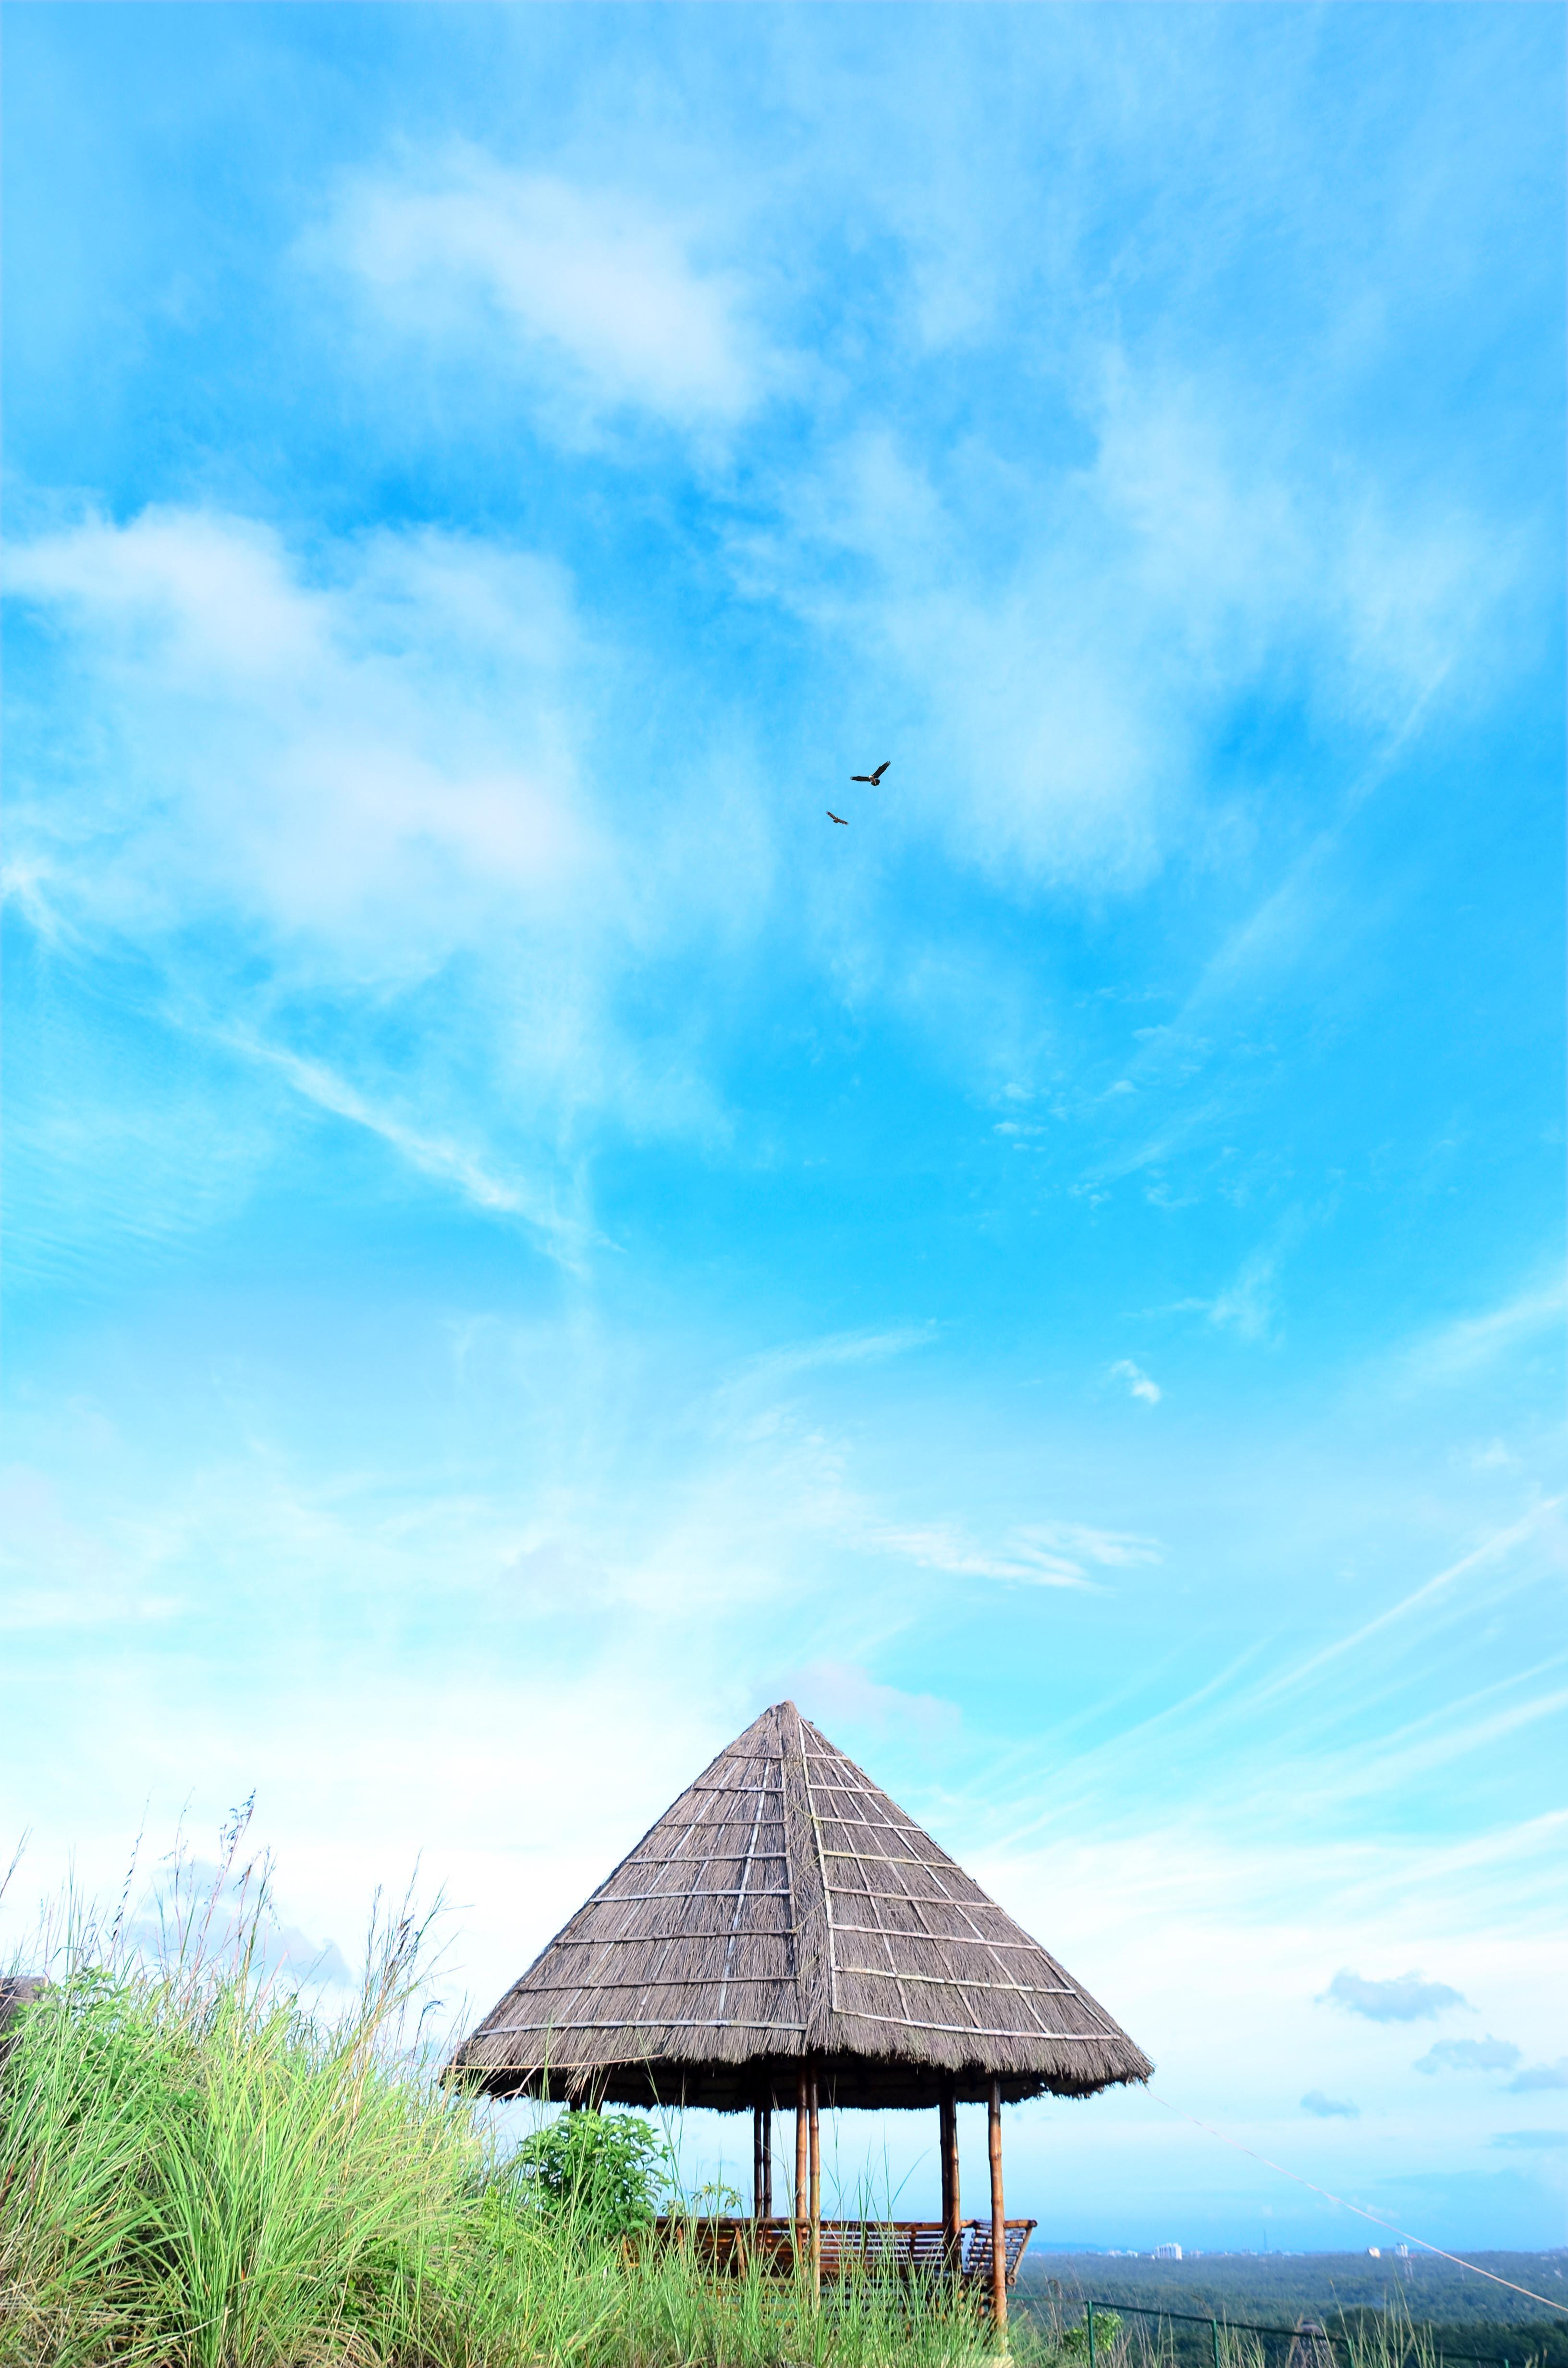 Top of hill, Blue, Hut, Landscape, Nature, HQ Photo